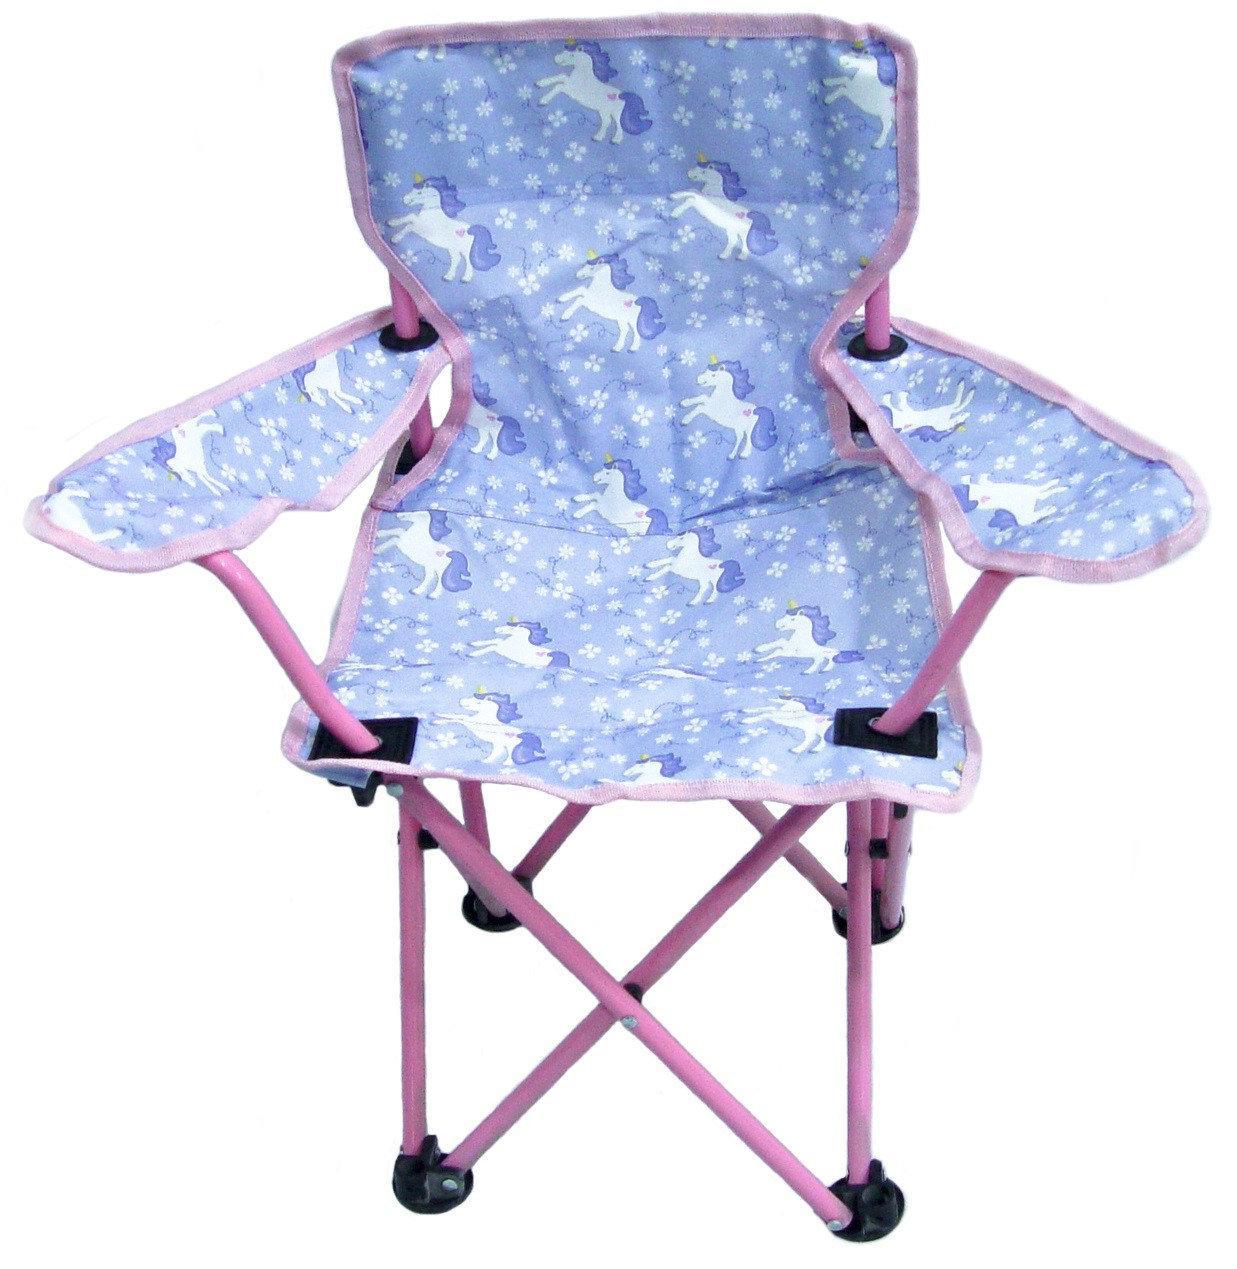 Кресло раскладное Паук XS MH-3085 38х38х60 см, единорог